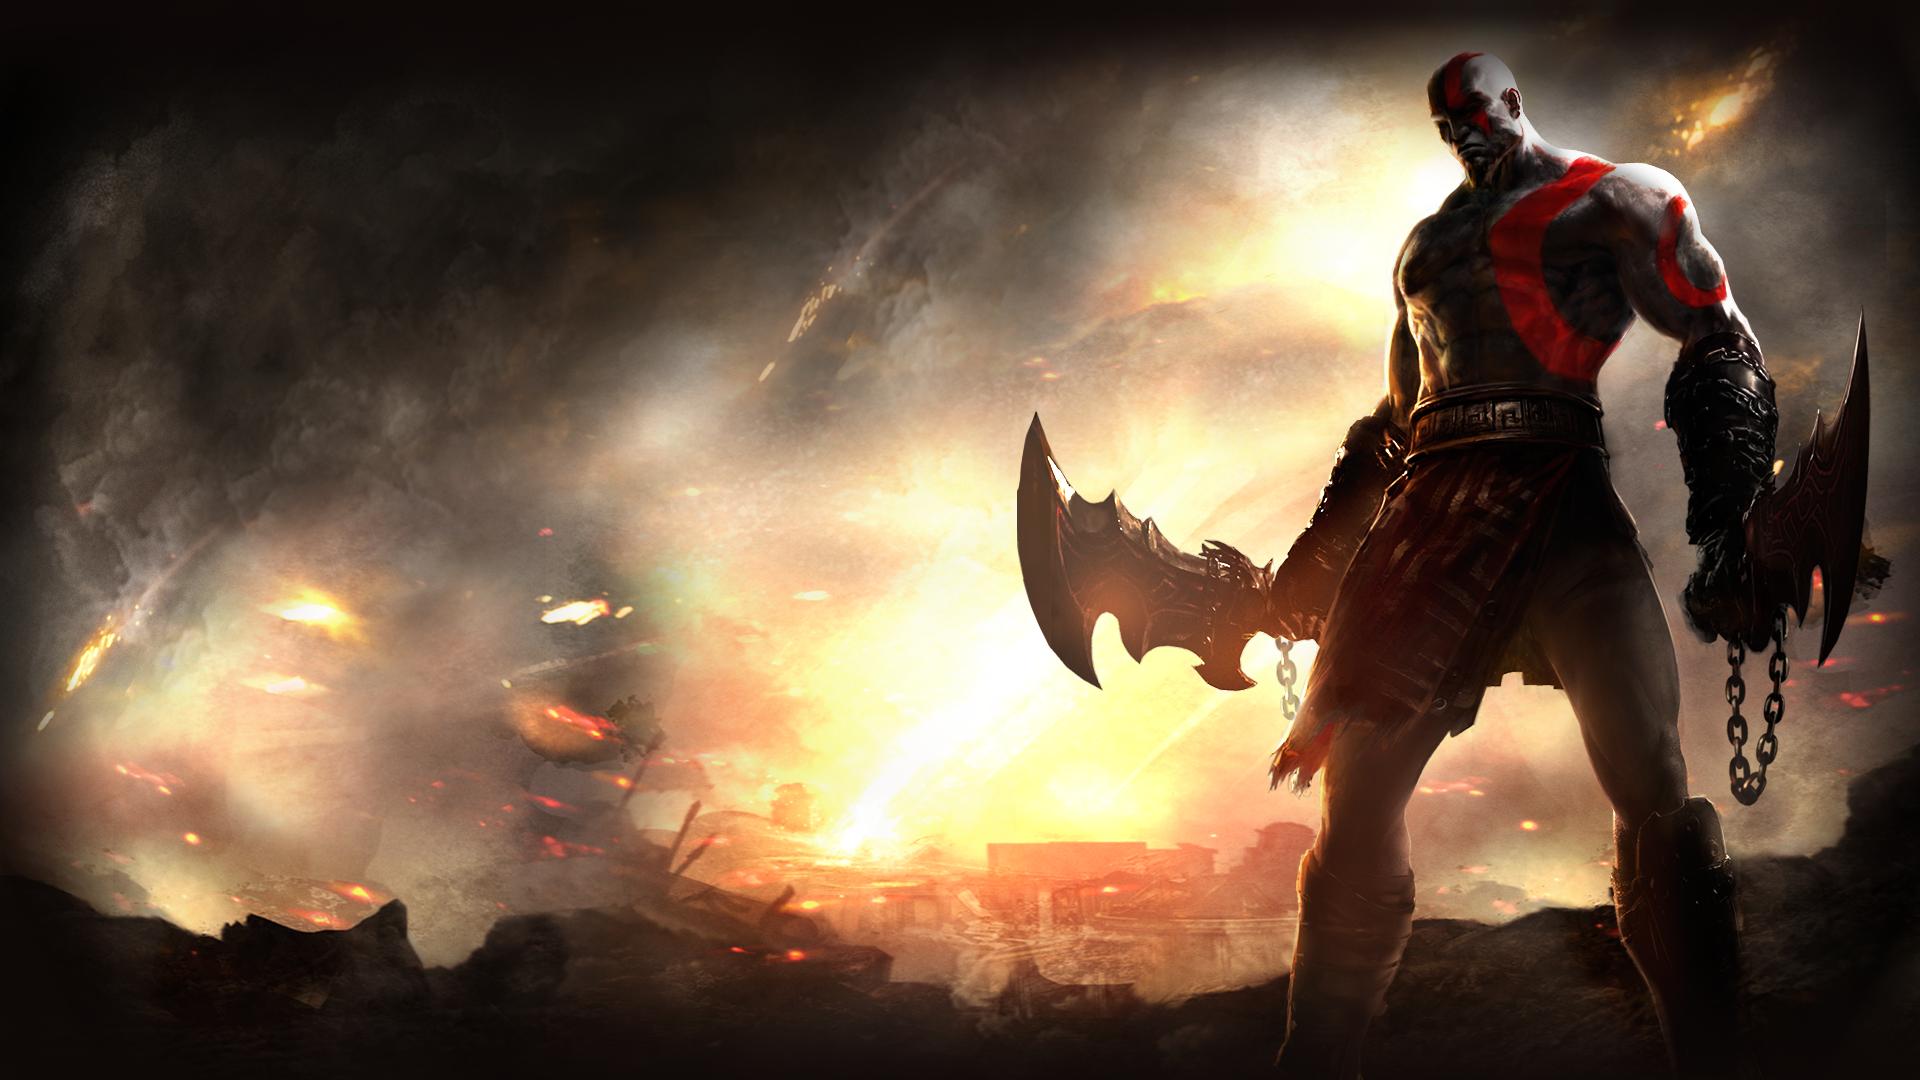 54 God Of War HD Wallpapers